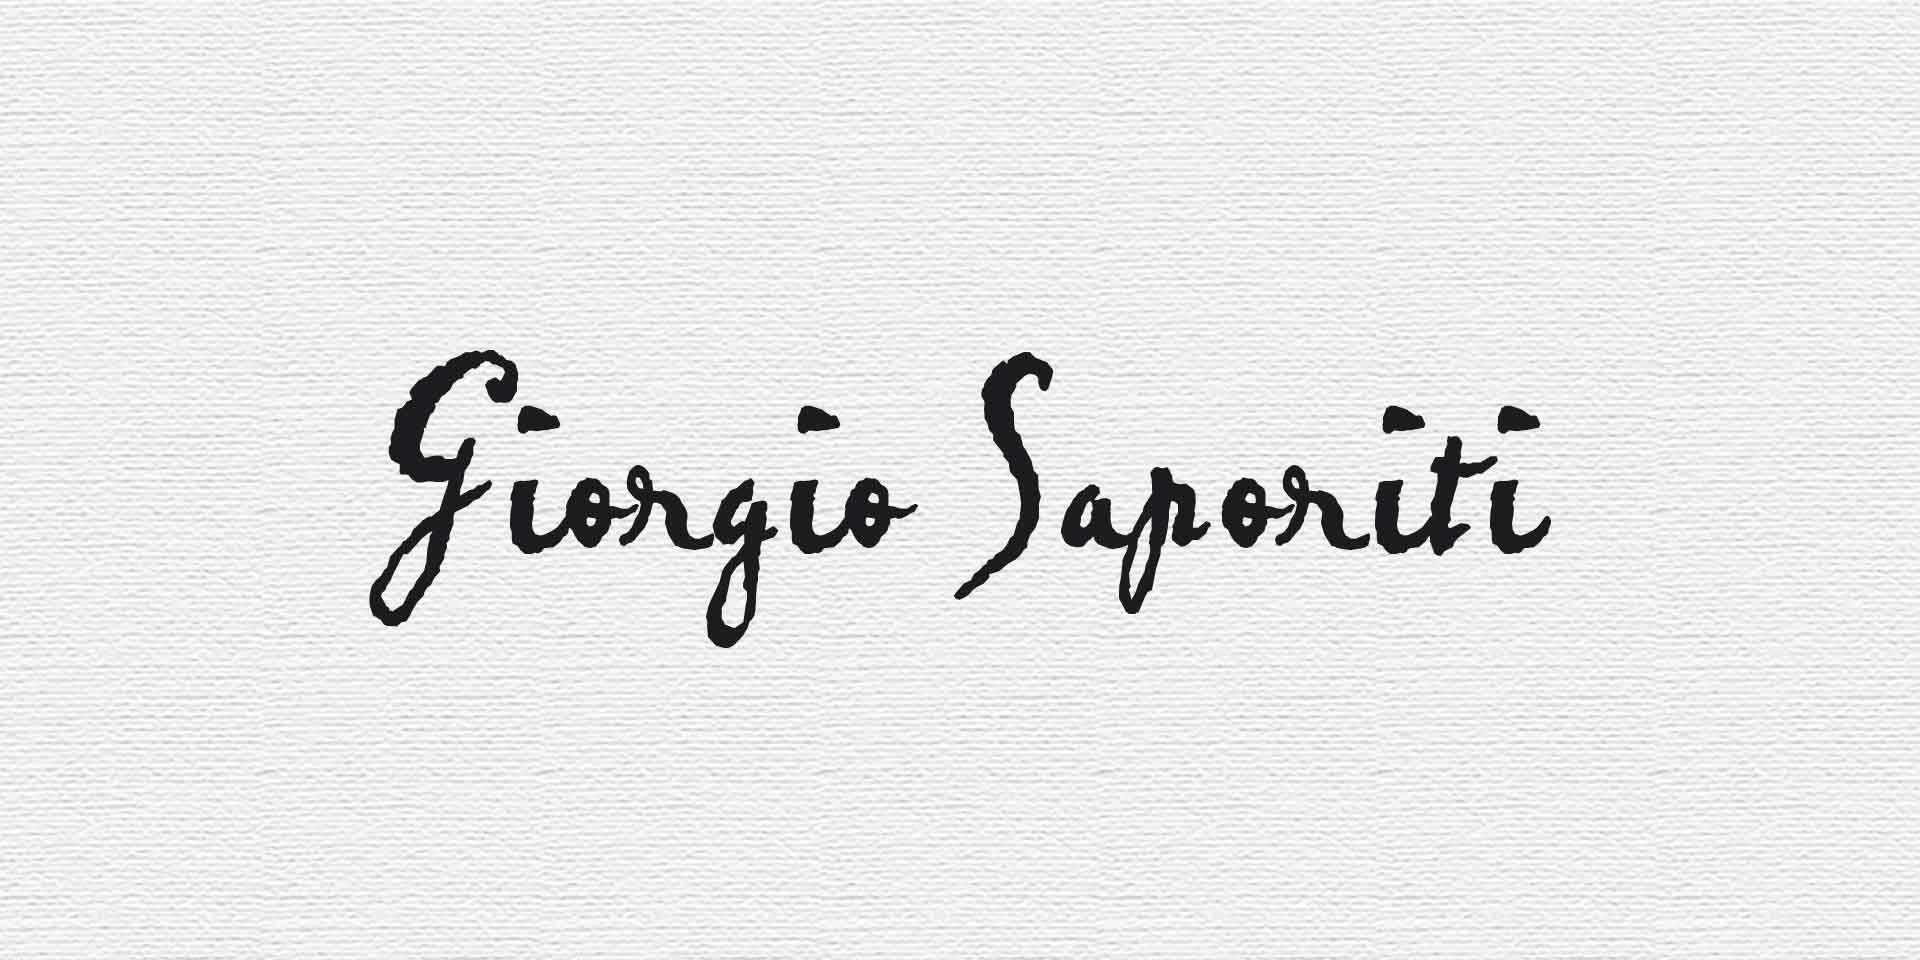 Giorgio Saporiti